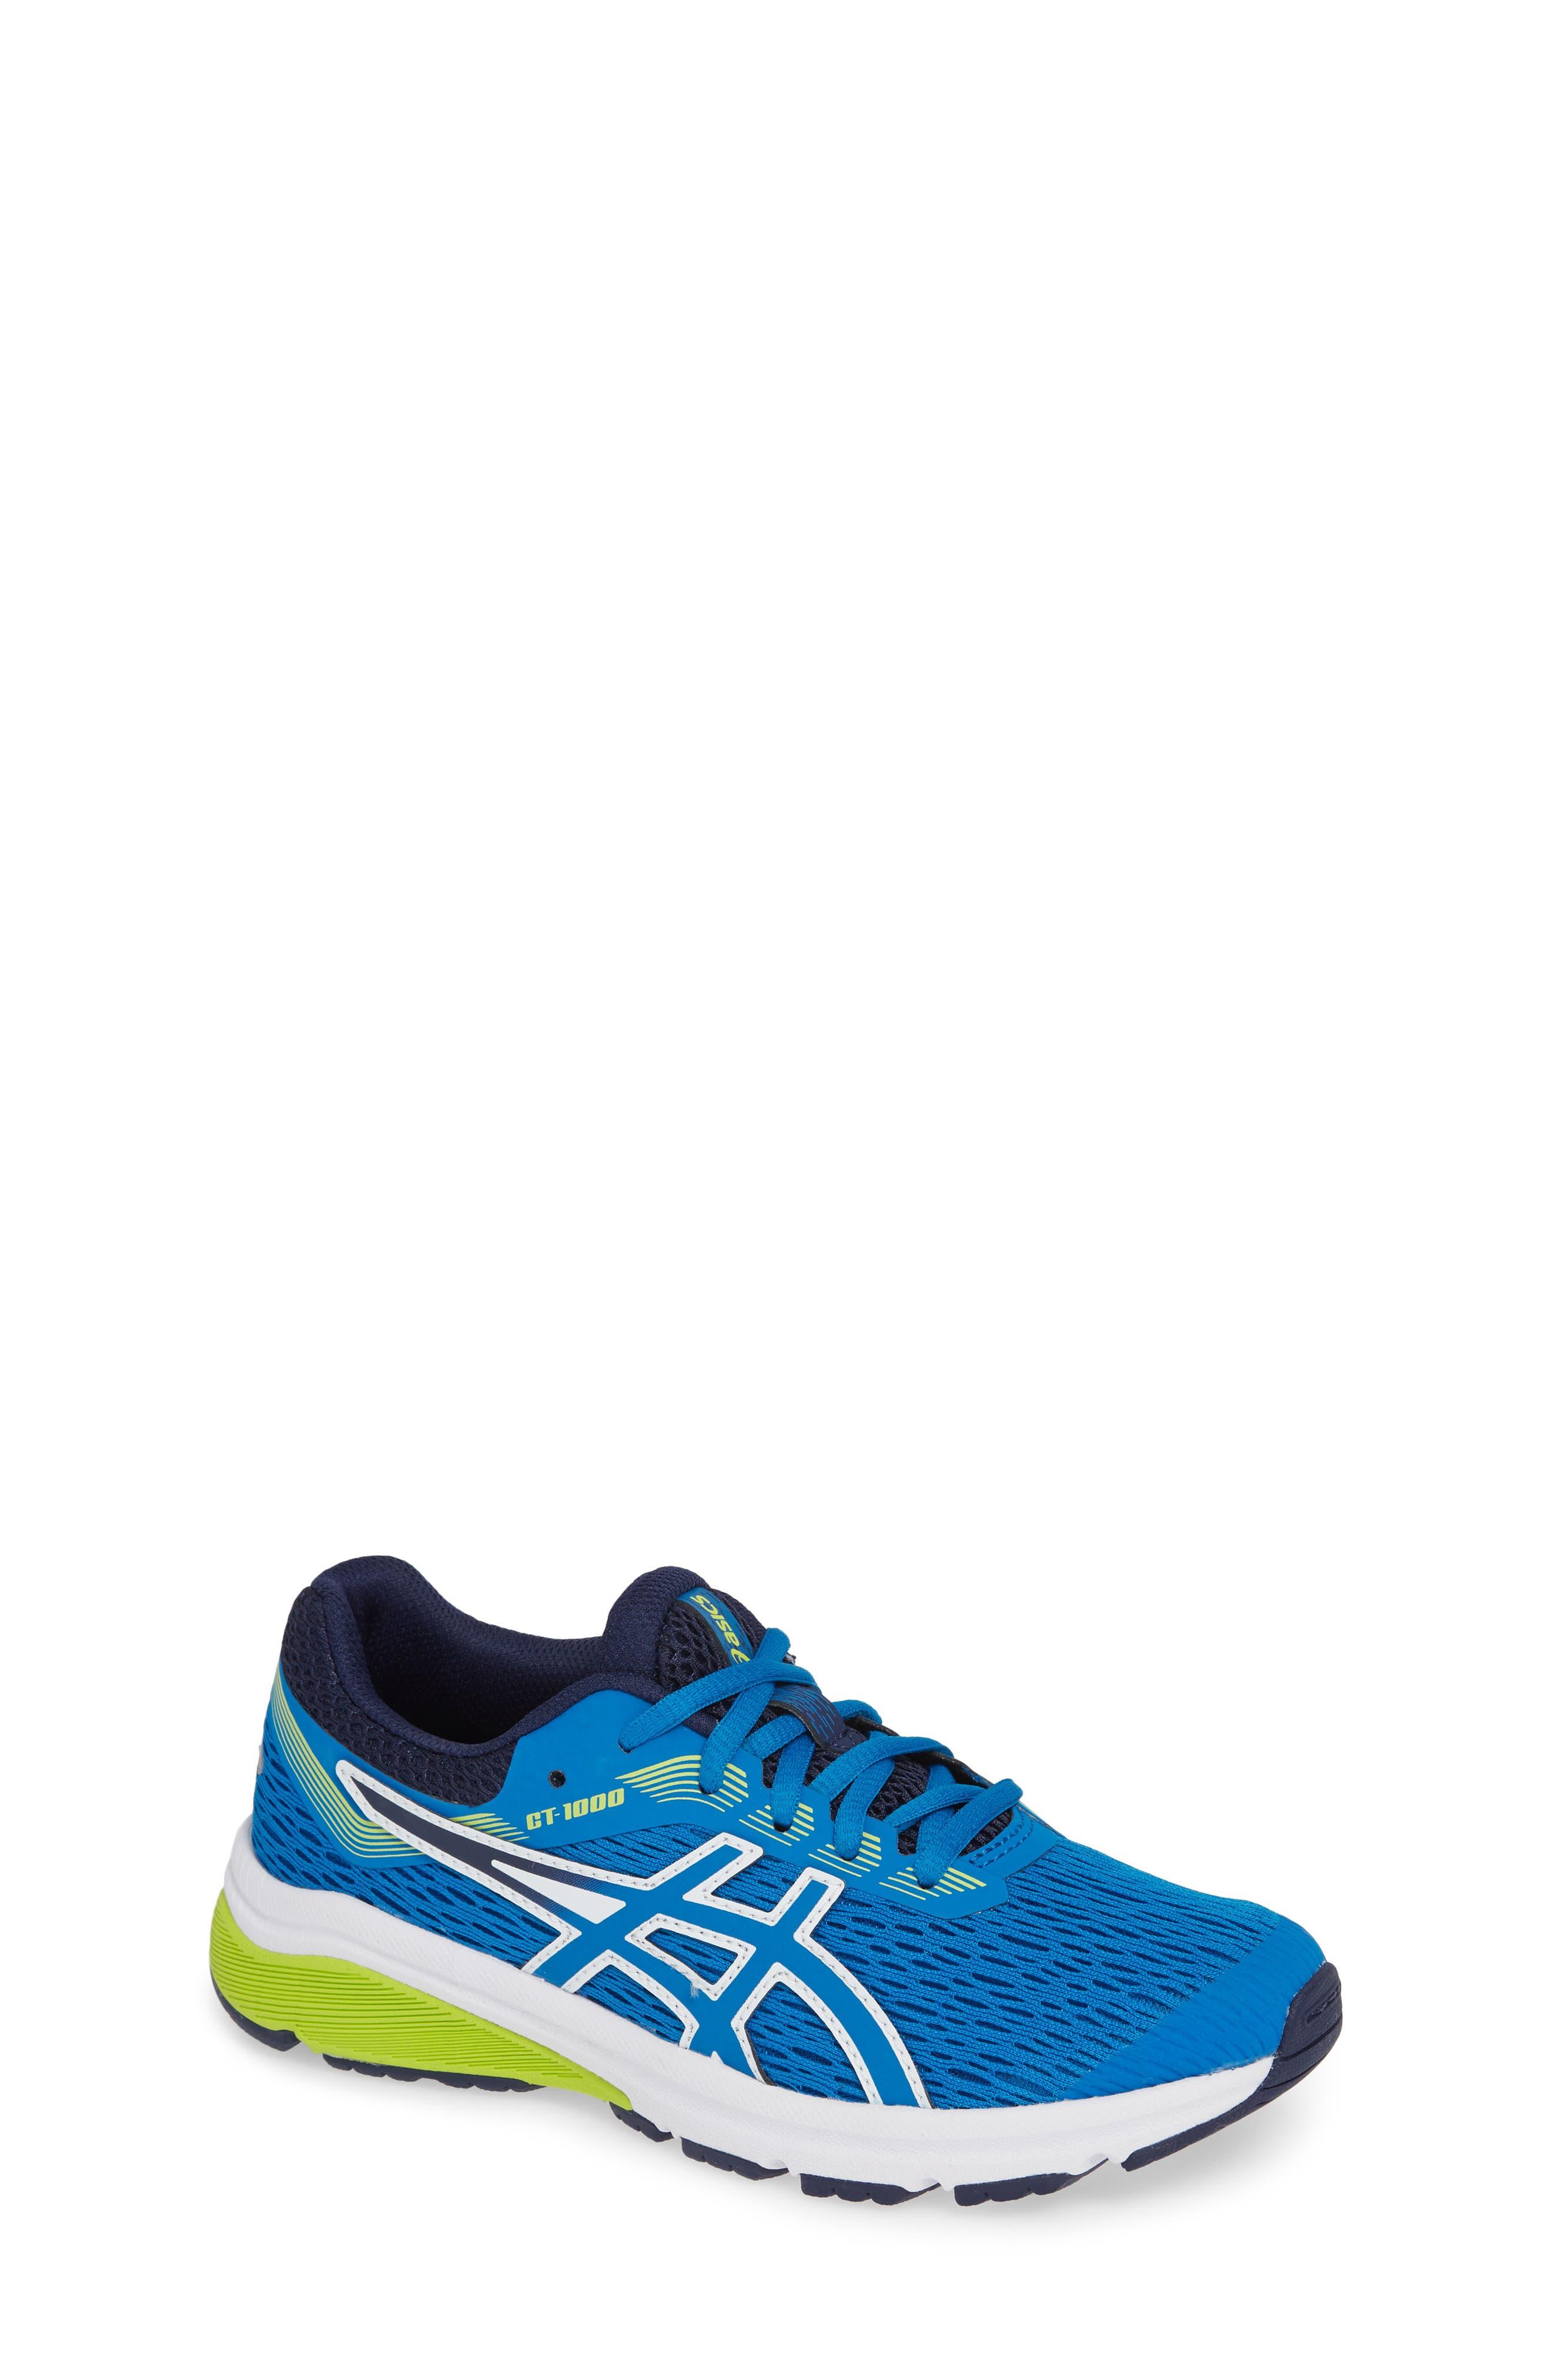 GT 1000 7 Running Shoe,                             Main thumbnail 1, color,                             RACE BLUE/ NEON LIME